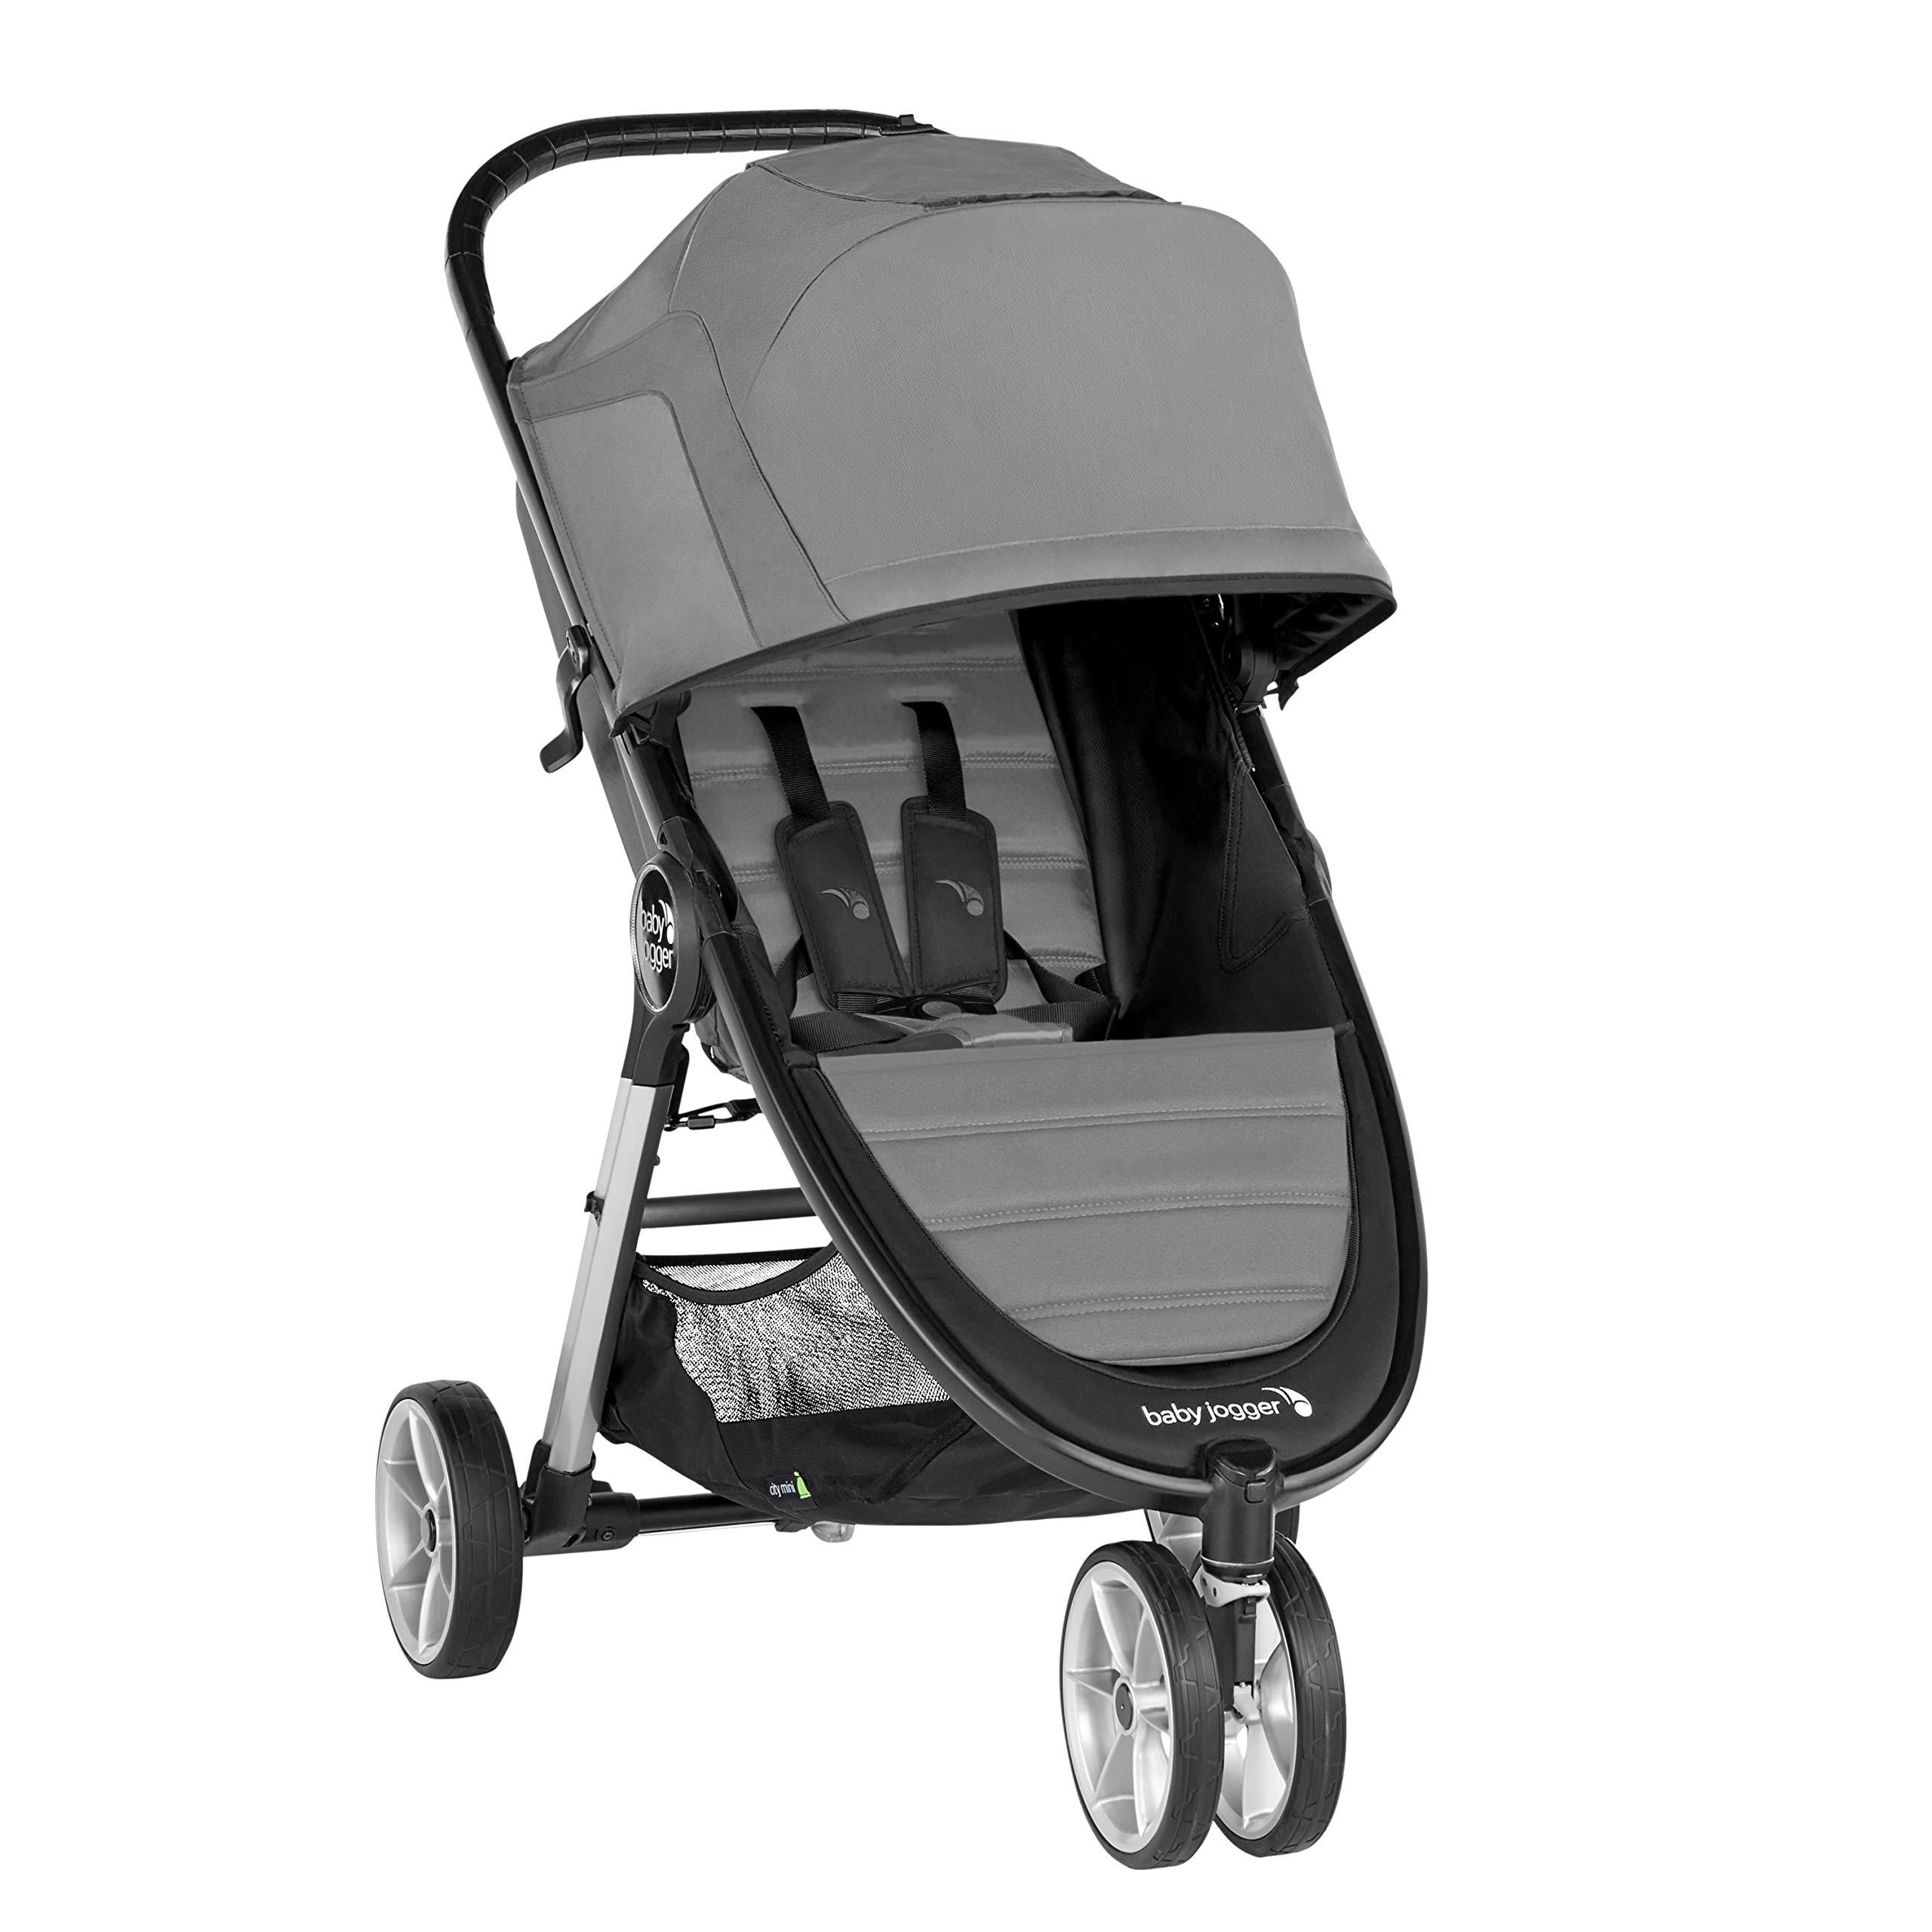 Baby Jogger City Mini 2 Stroller - 2019   Compact, Lightweight Stroller   Quick Fold Baby Stroller, Slate by Baby Jogger